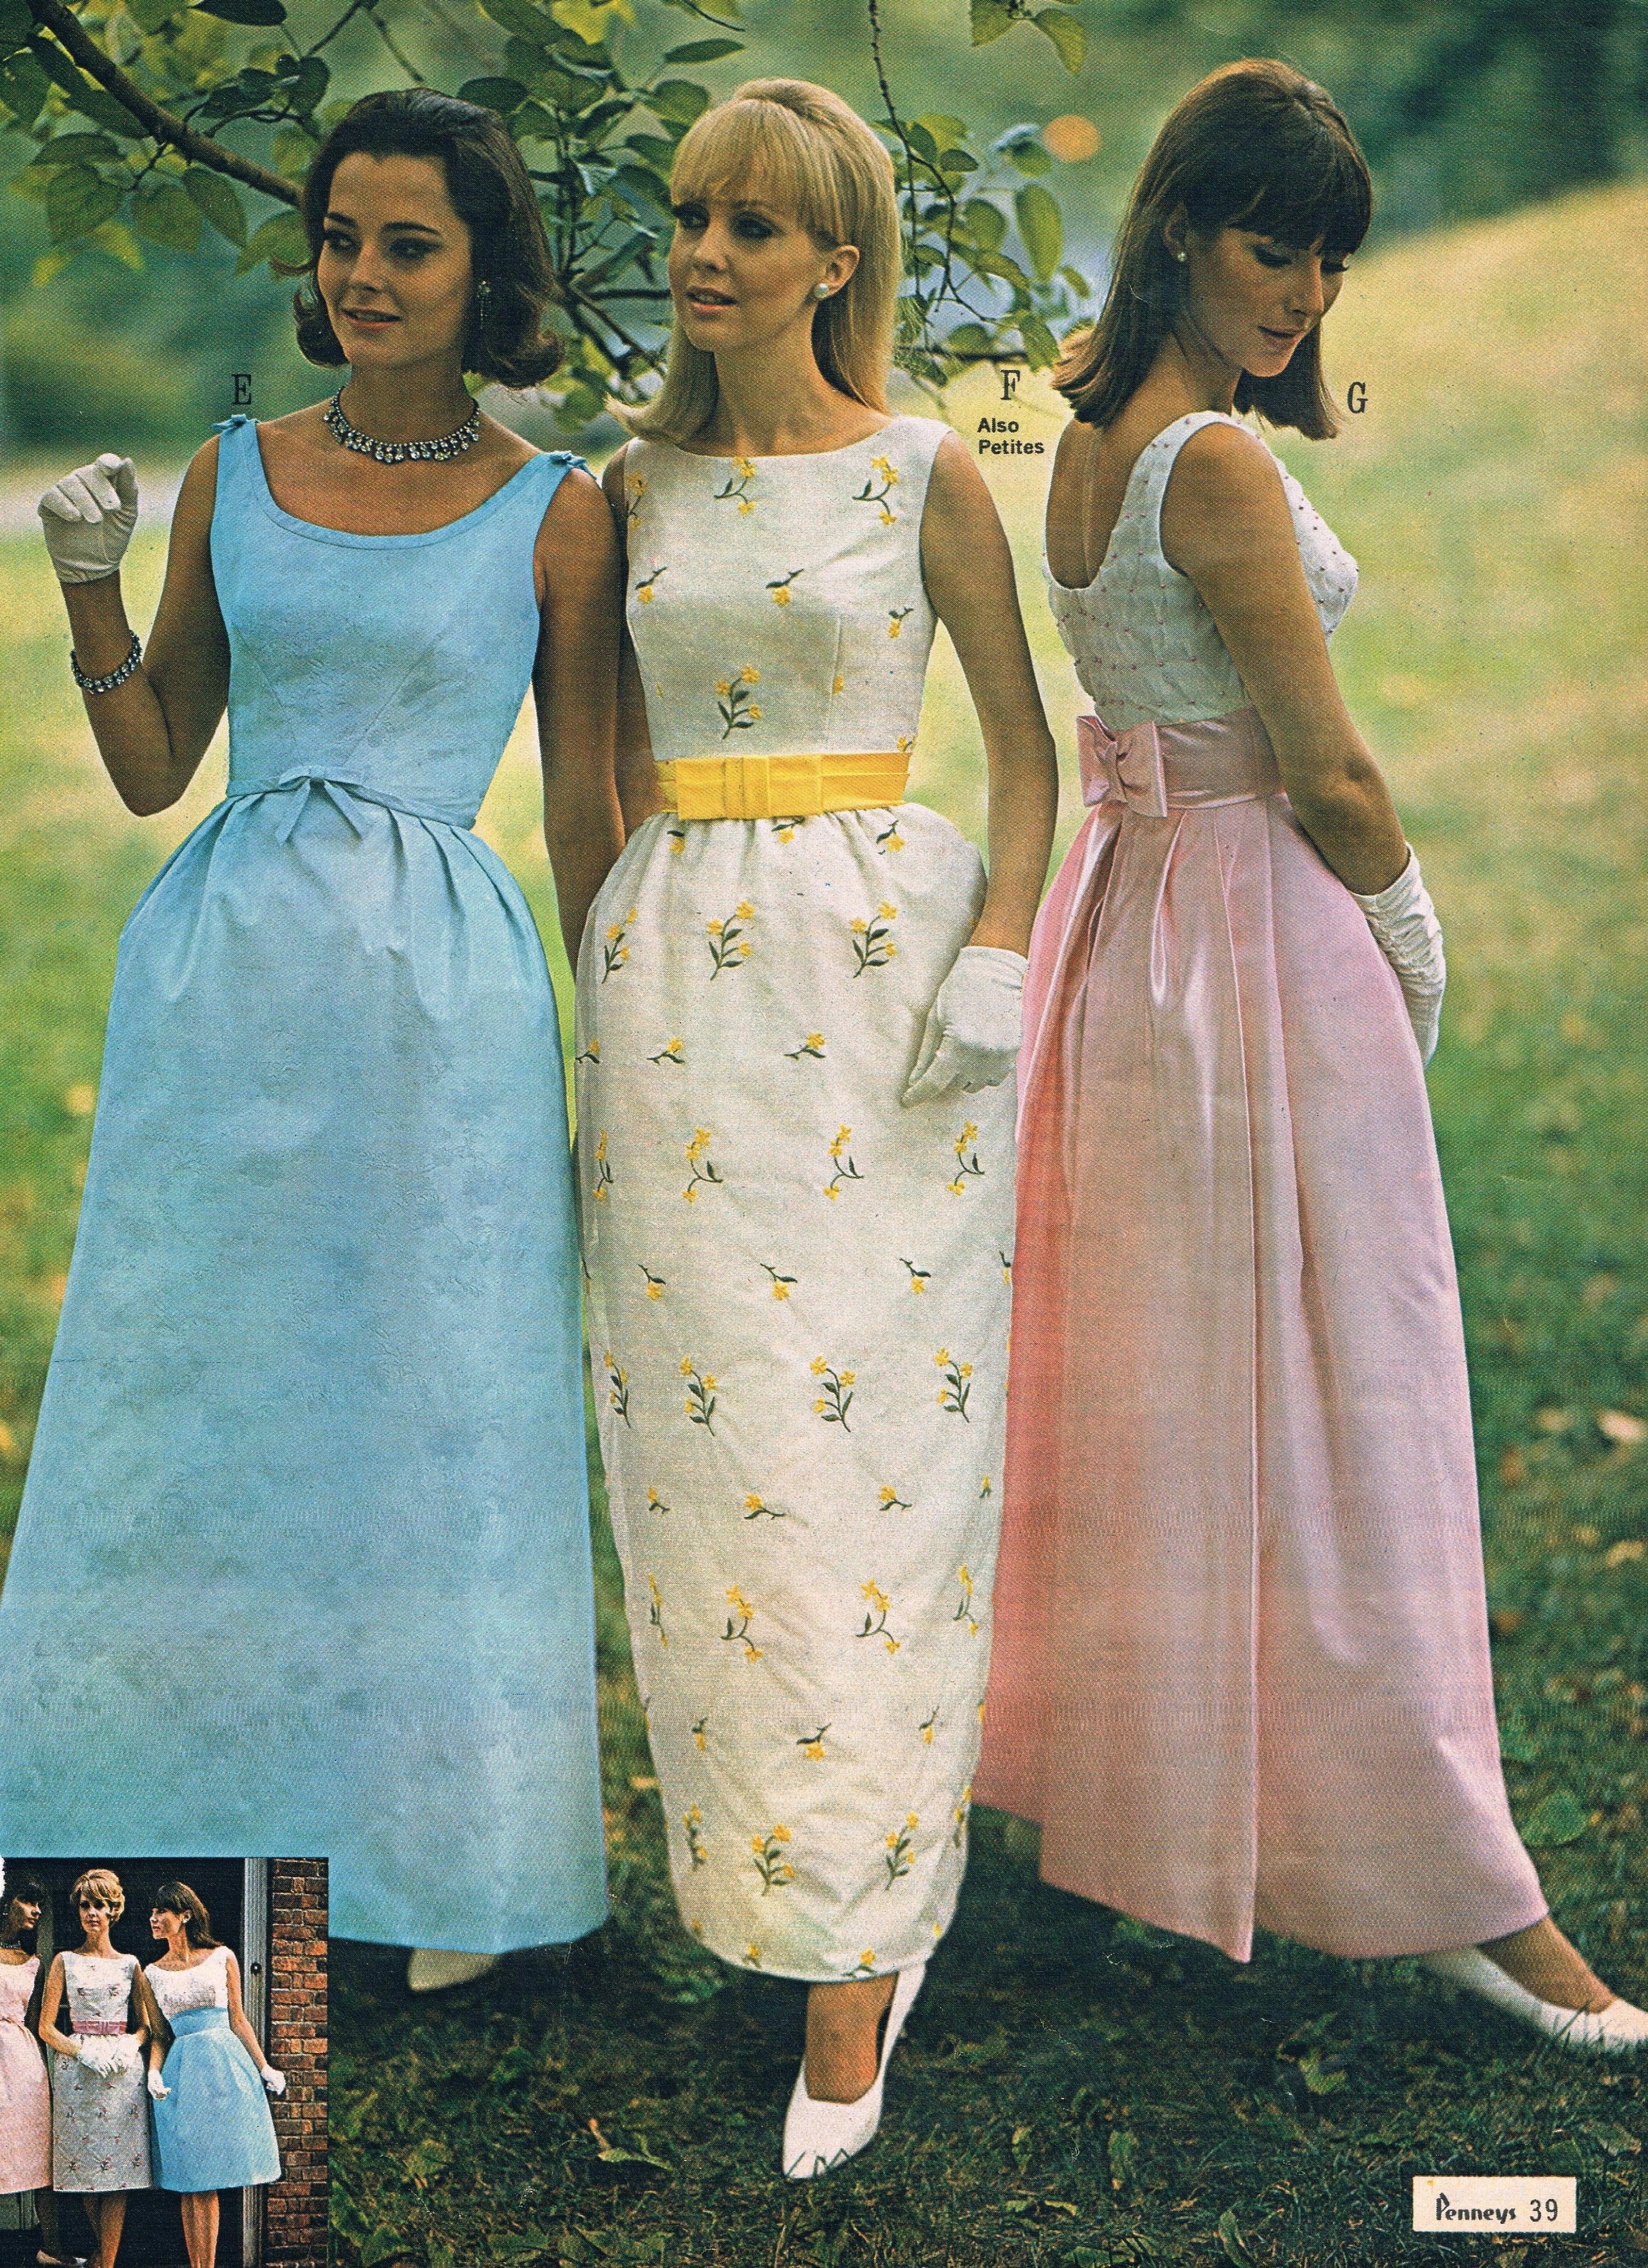 Penneys Catalog 60s Vintage Style Prom Dresses Prom Dresses Vintage 1960s Fashion Women [ 4261 x 3097 Pixel ]